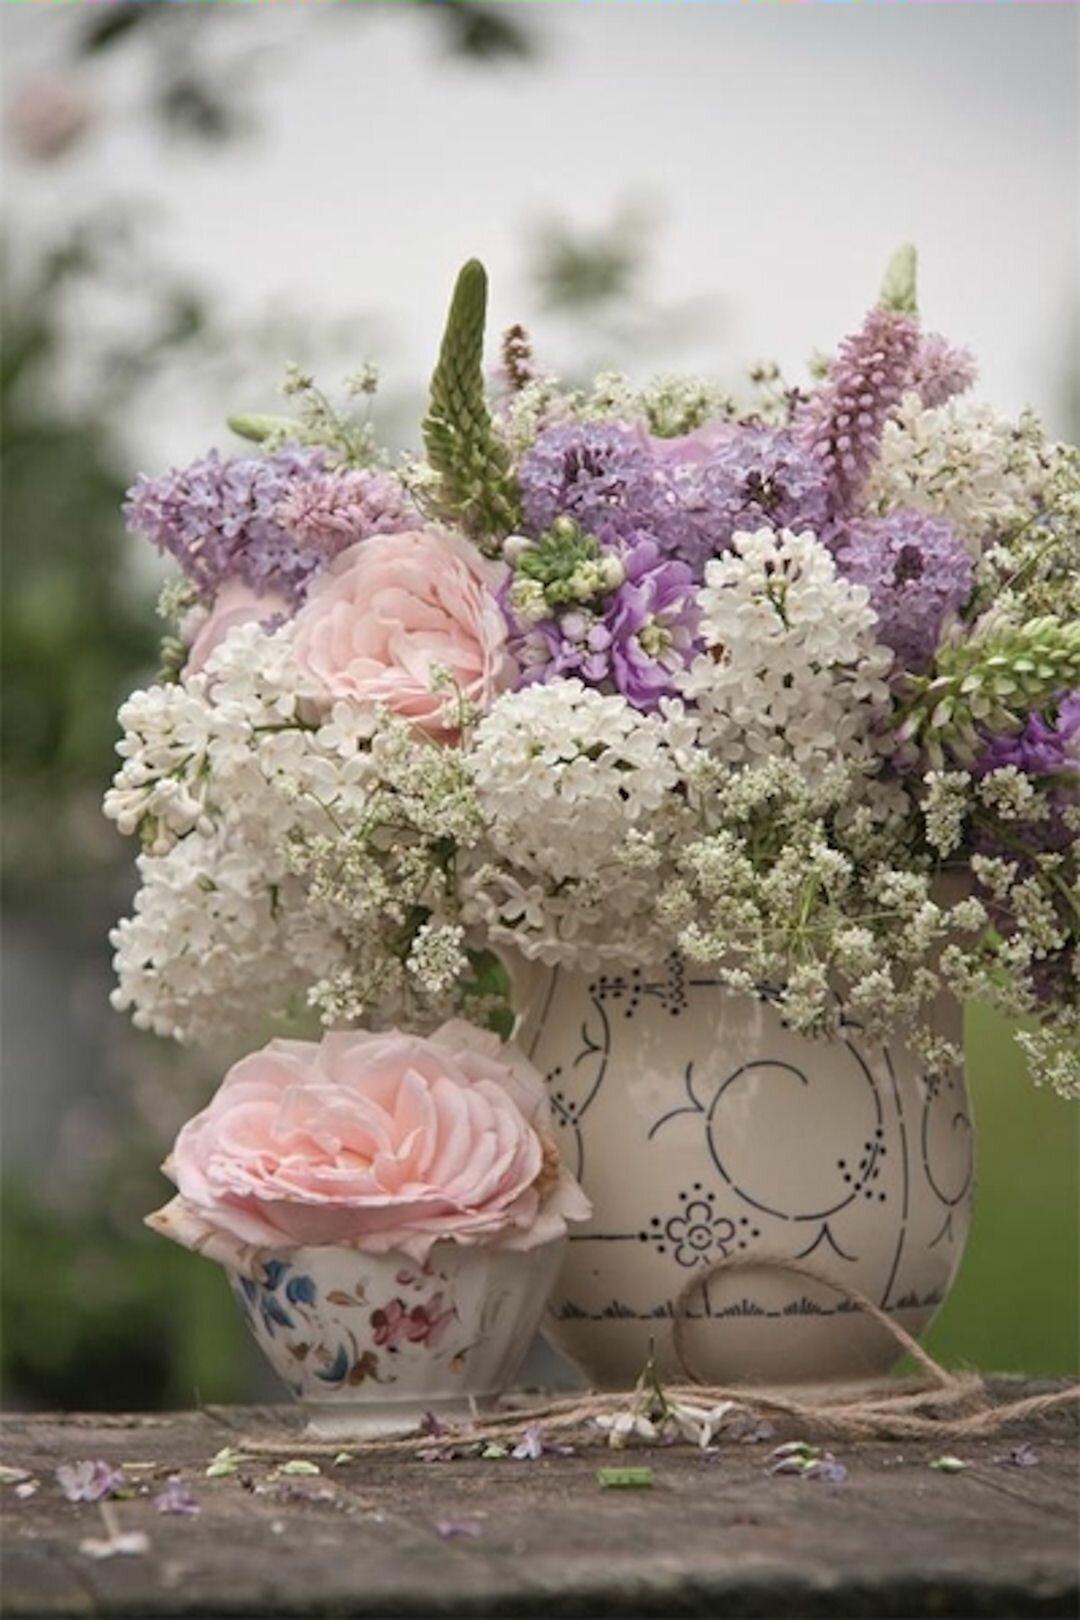 Картинки с цветами в стиле прованс, днем